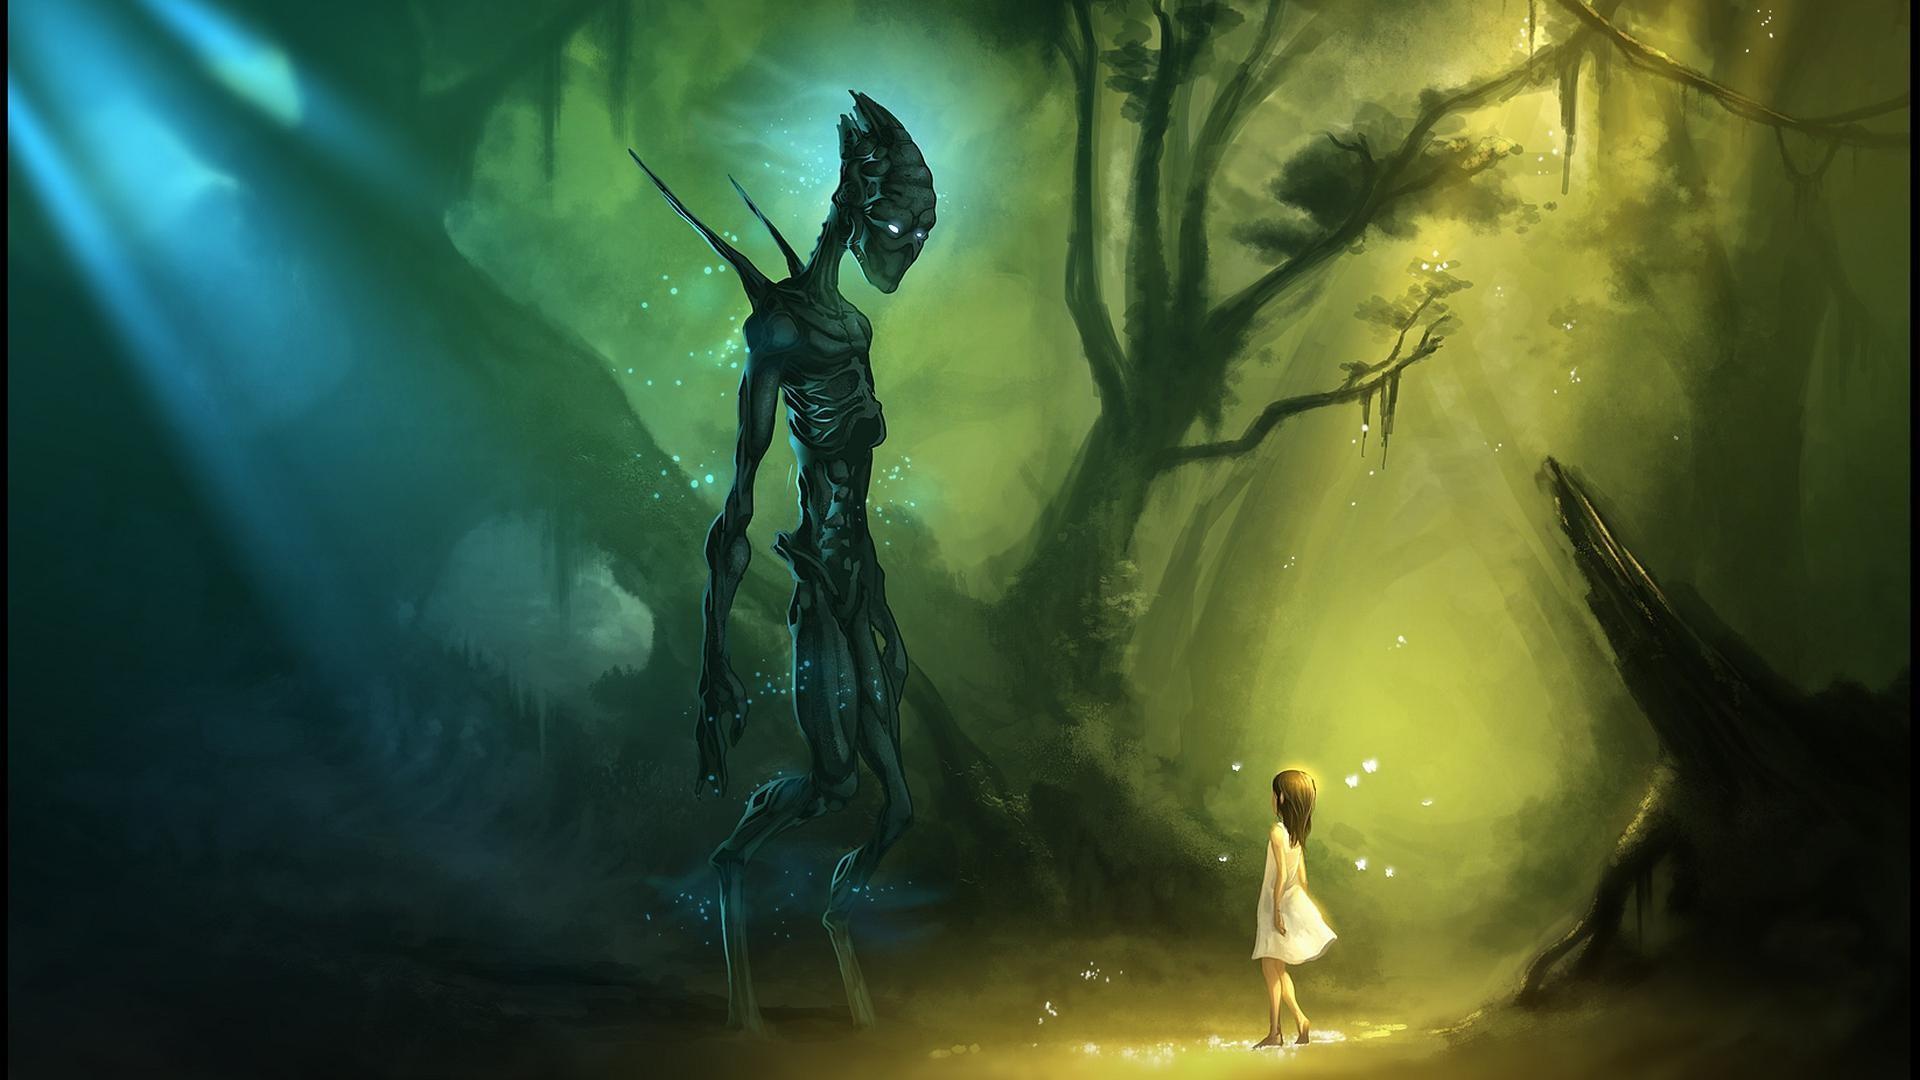 Alien-Backgrounds-For-Desktop